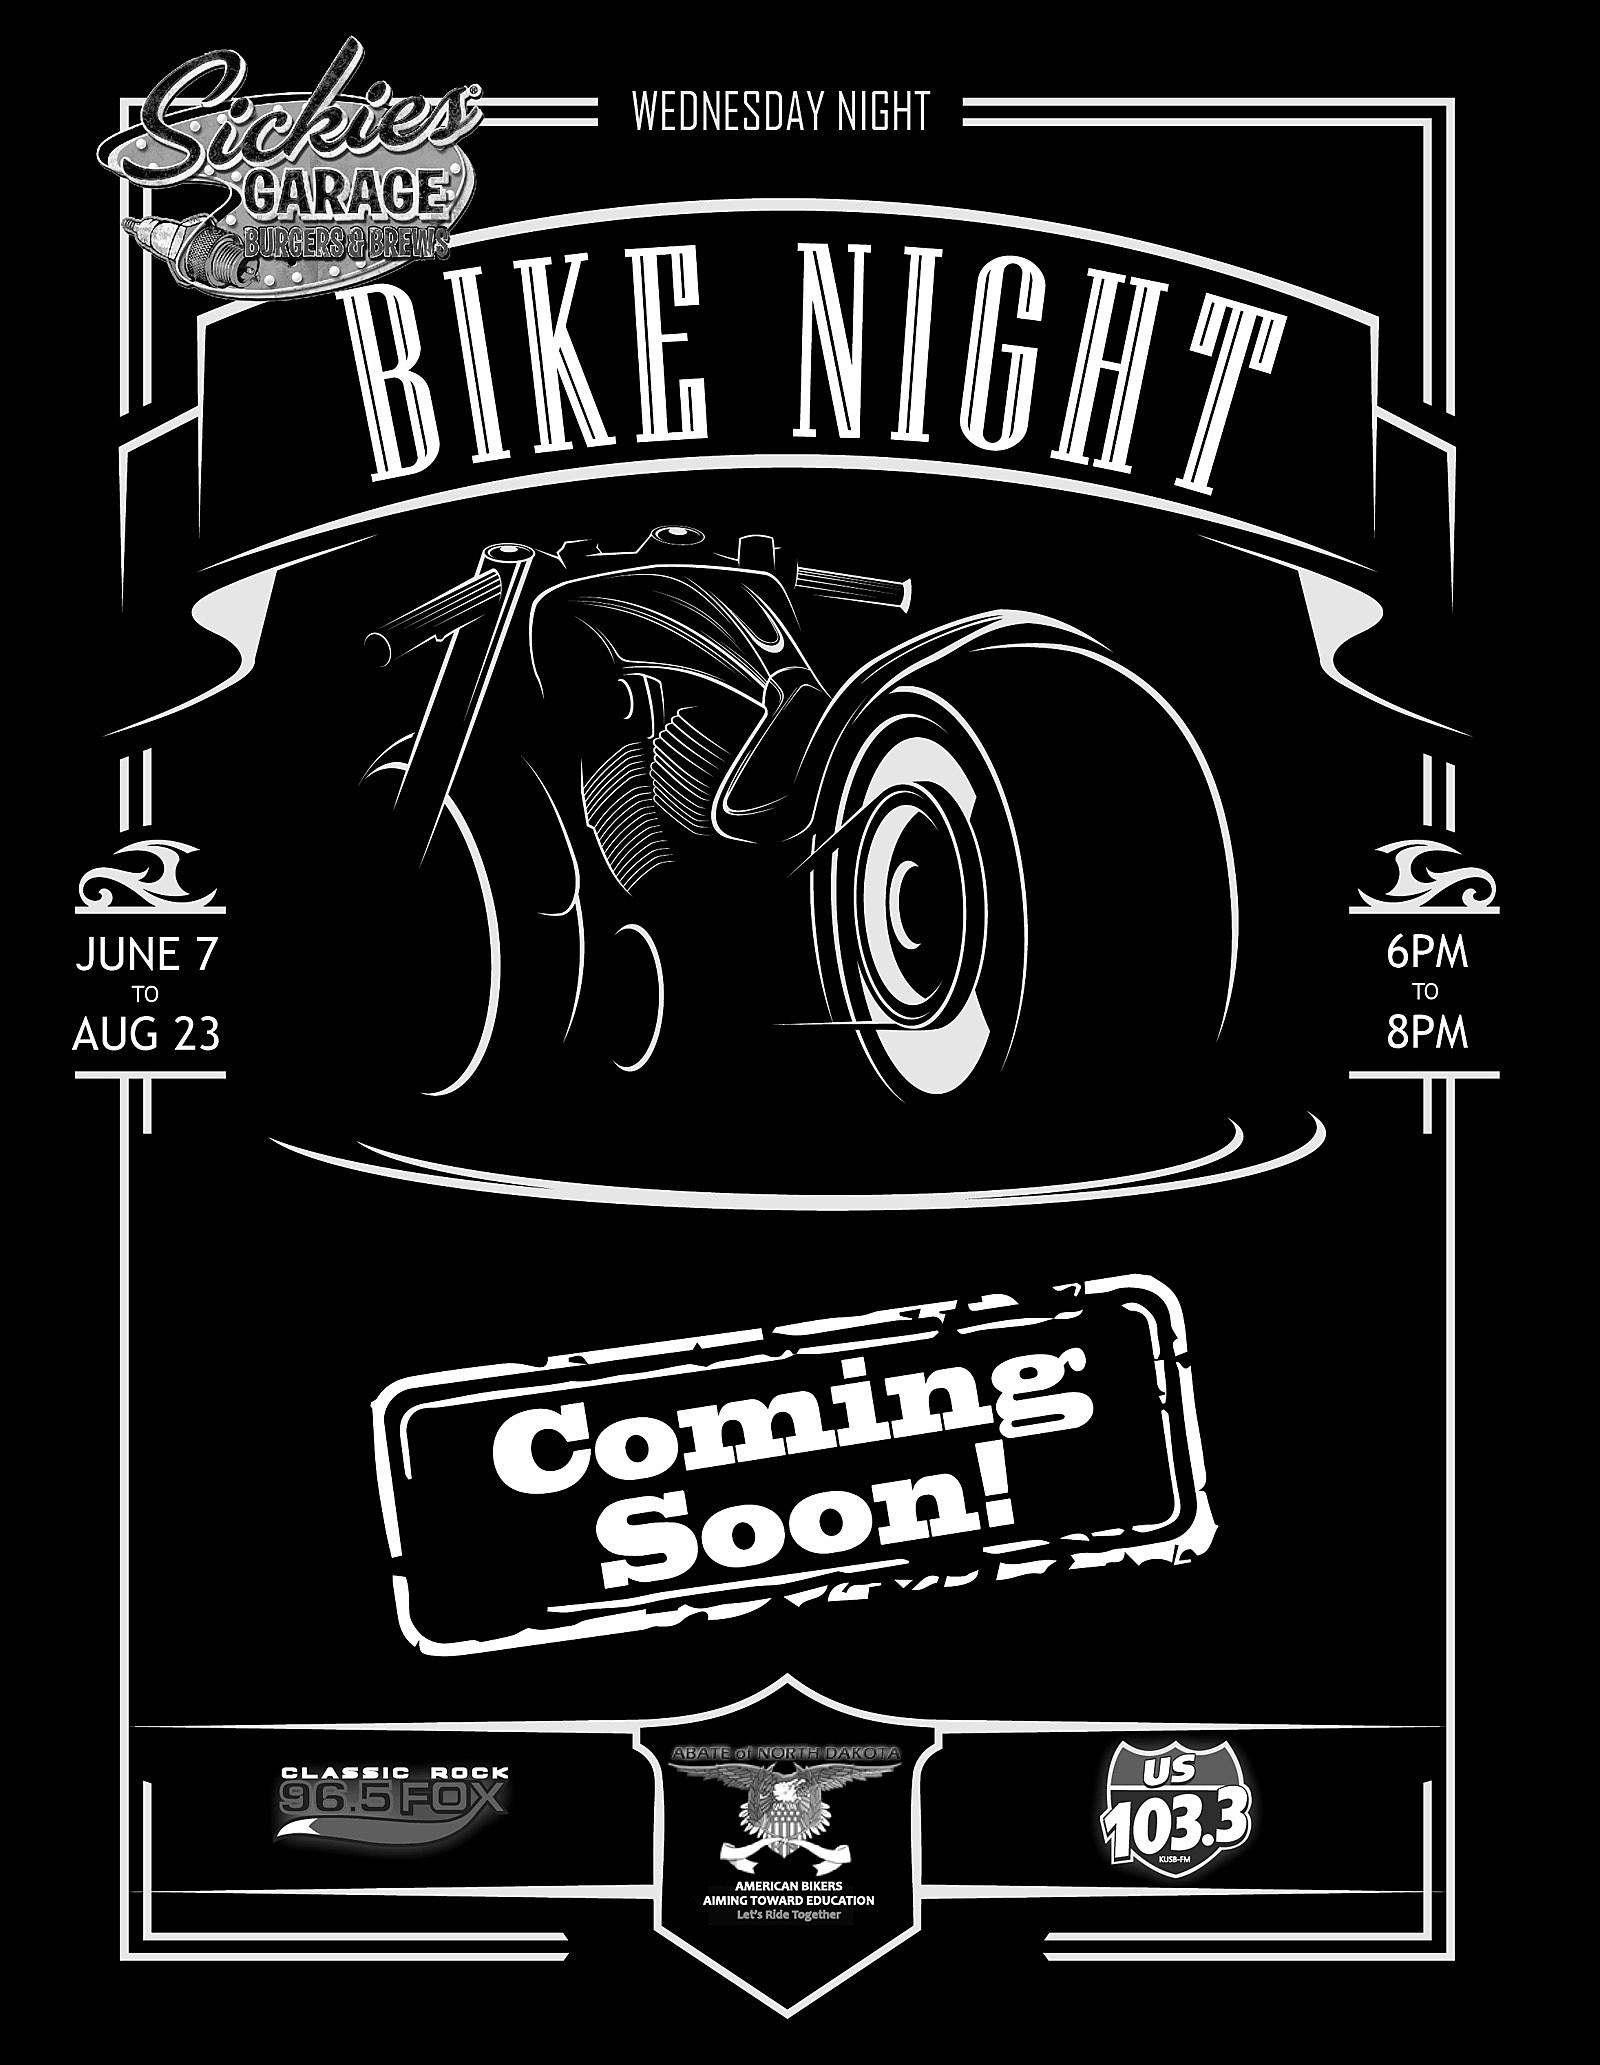 bike night abate - coming soon